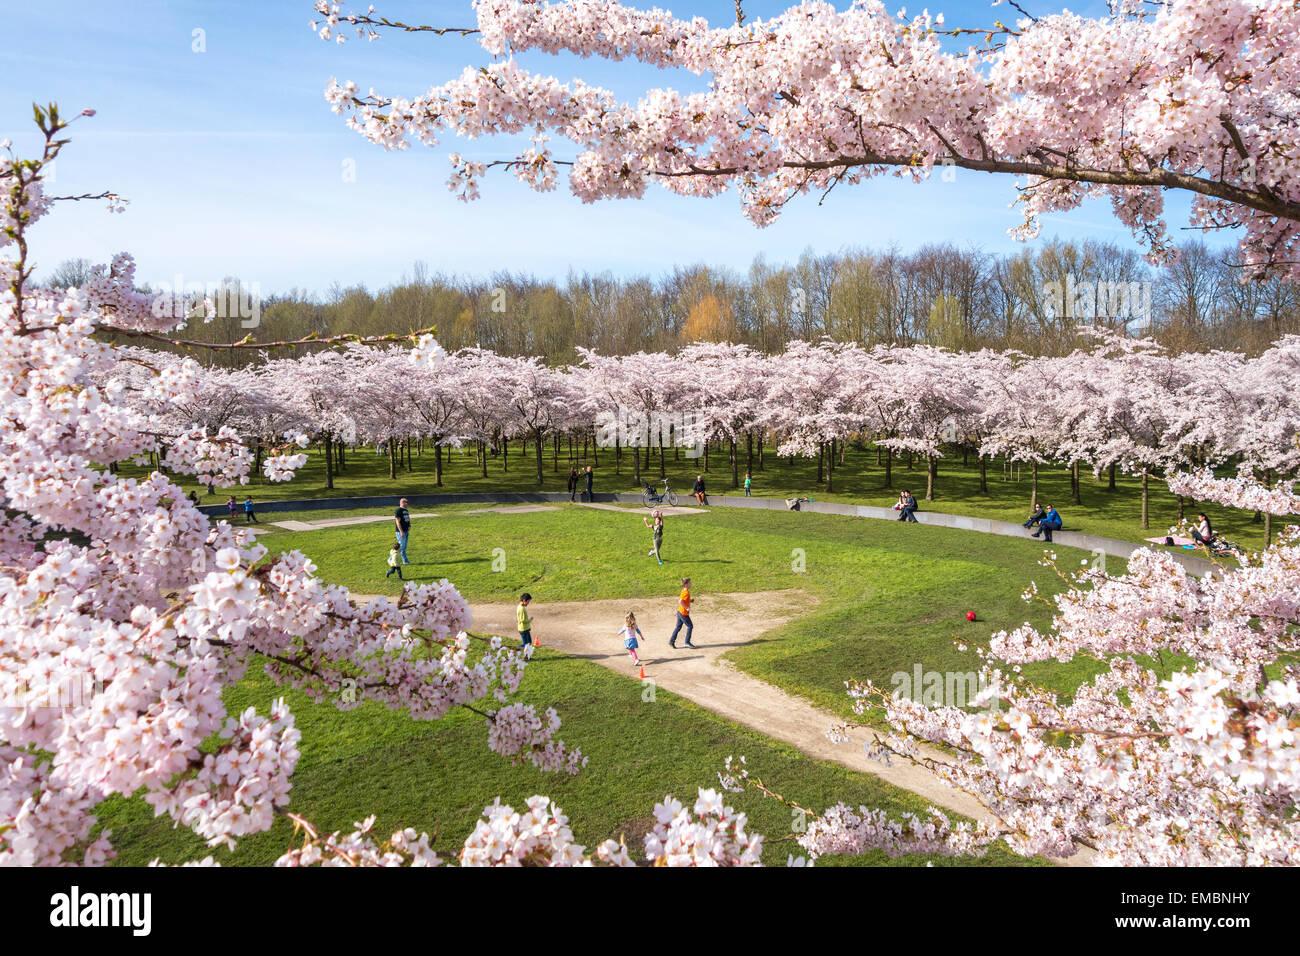 https://c7.alamy.com/comp/EMBNHY/amsterdam-amsterdamse-bos-bloesempark-cherry-blossom-park-boys-girls-EMBNHY.jpg